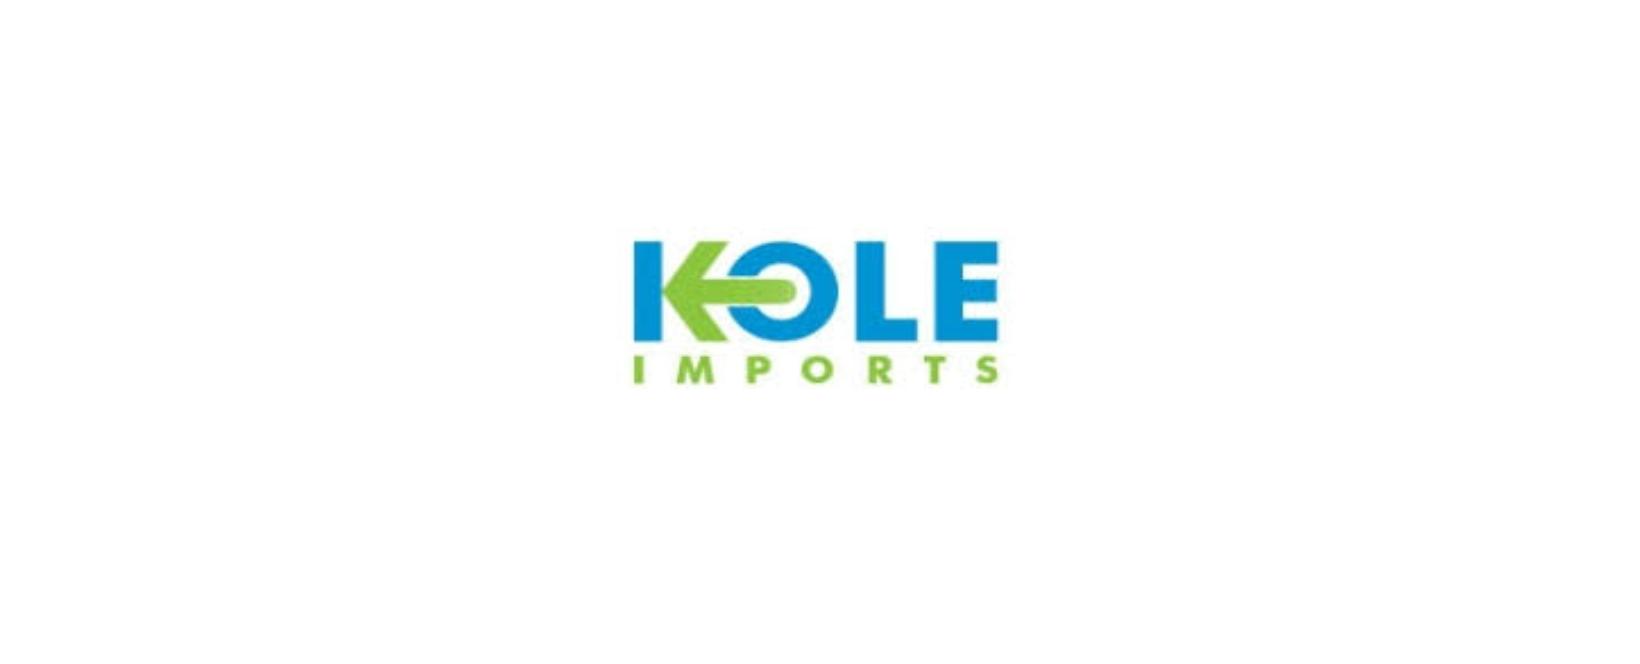 Kole Imports Discount Code 2021